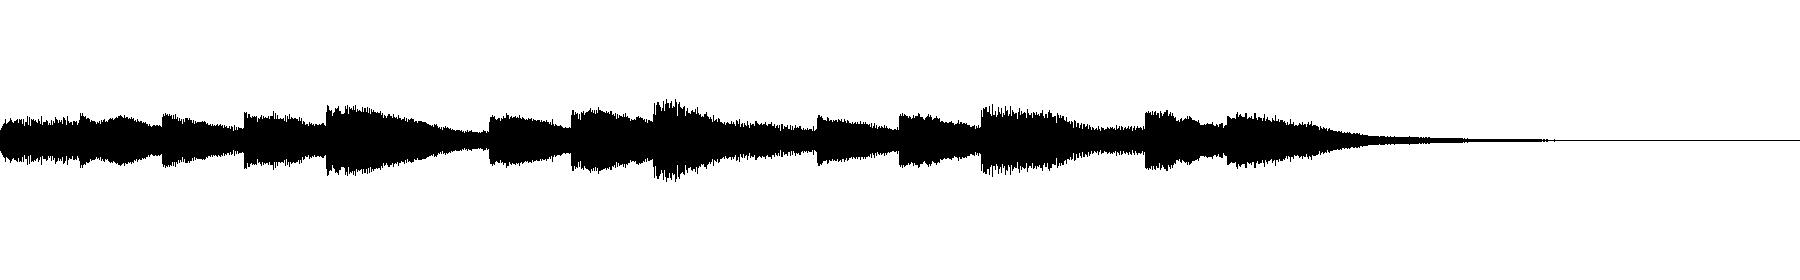 sad rhodes chords